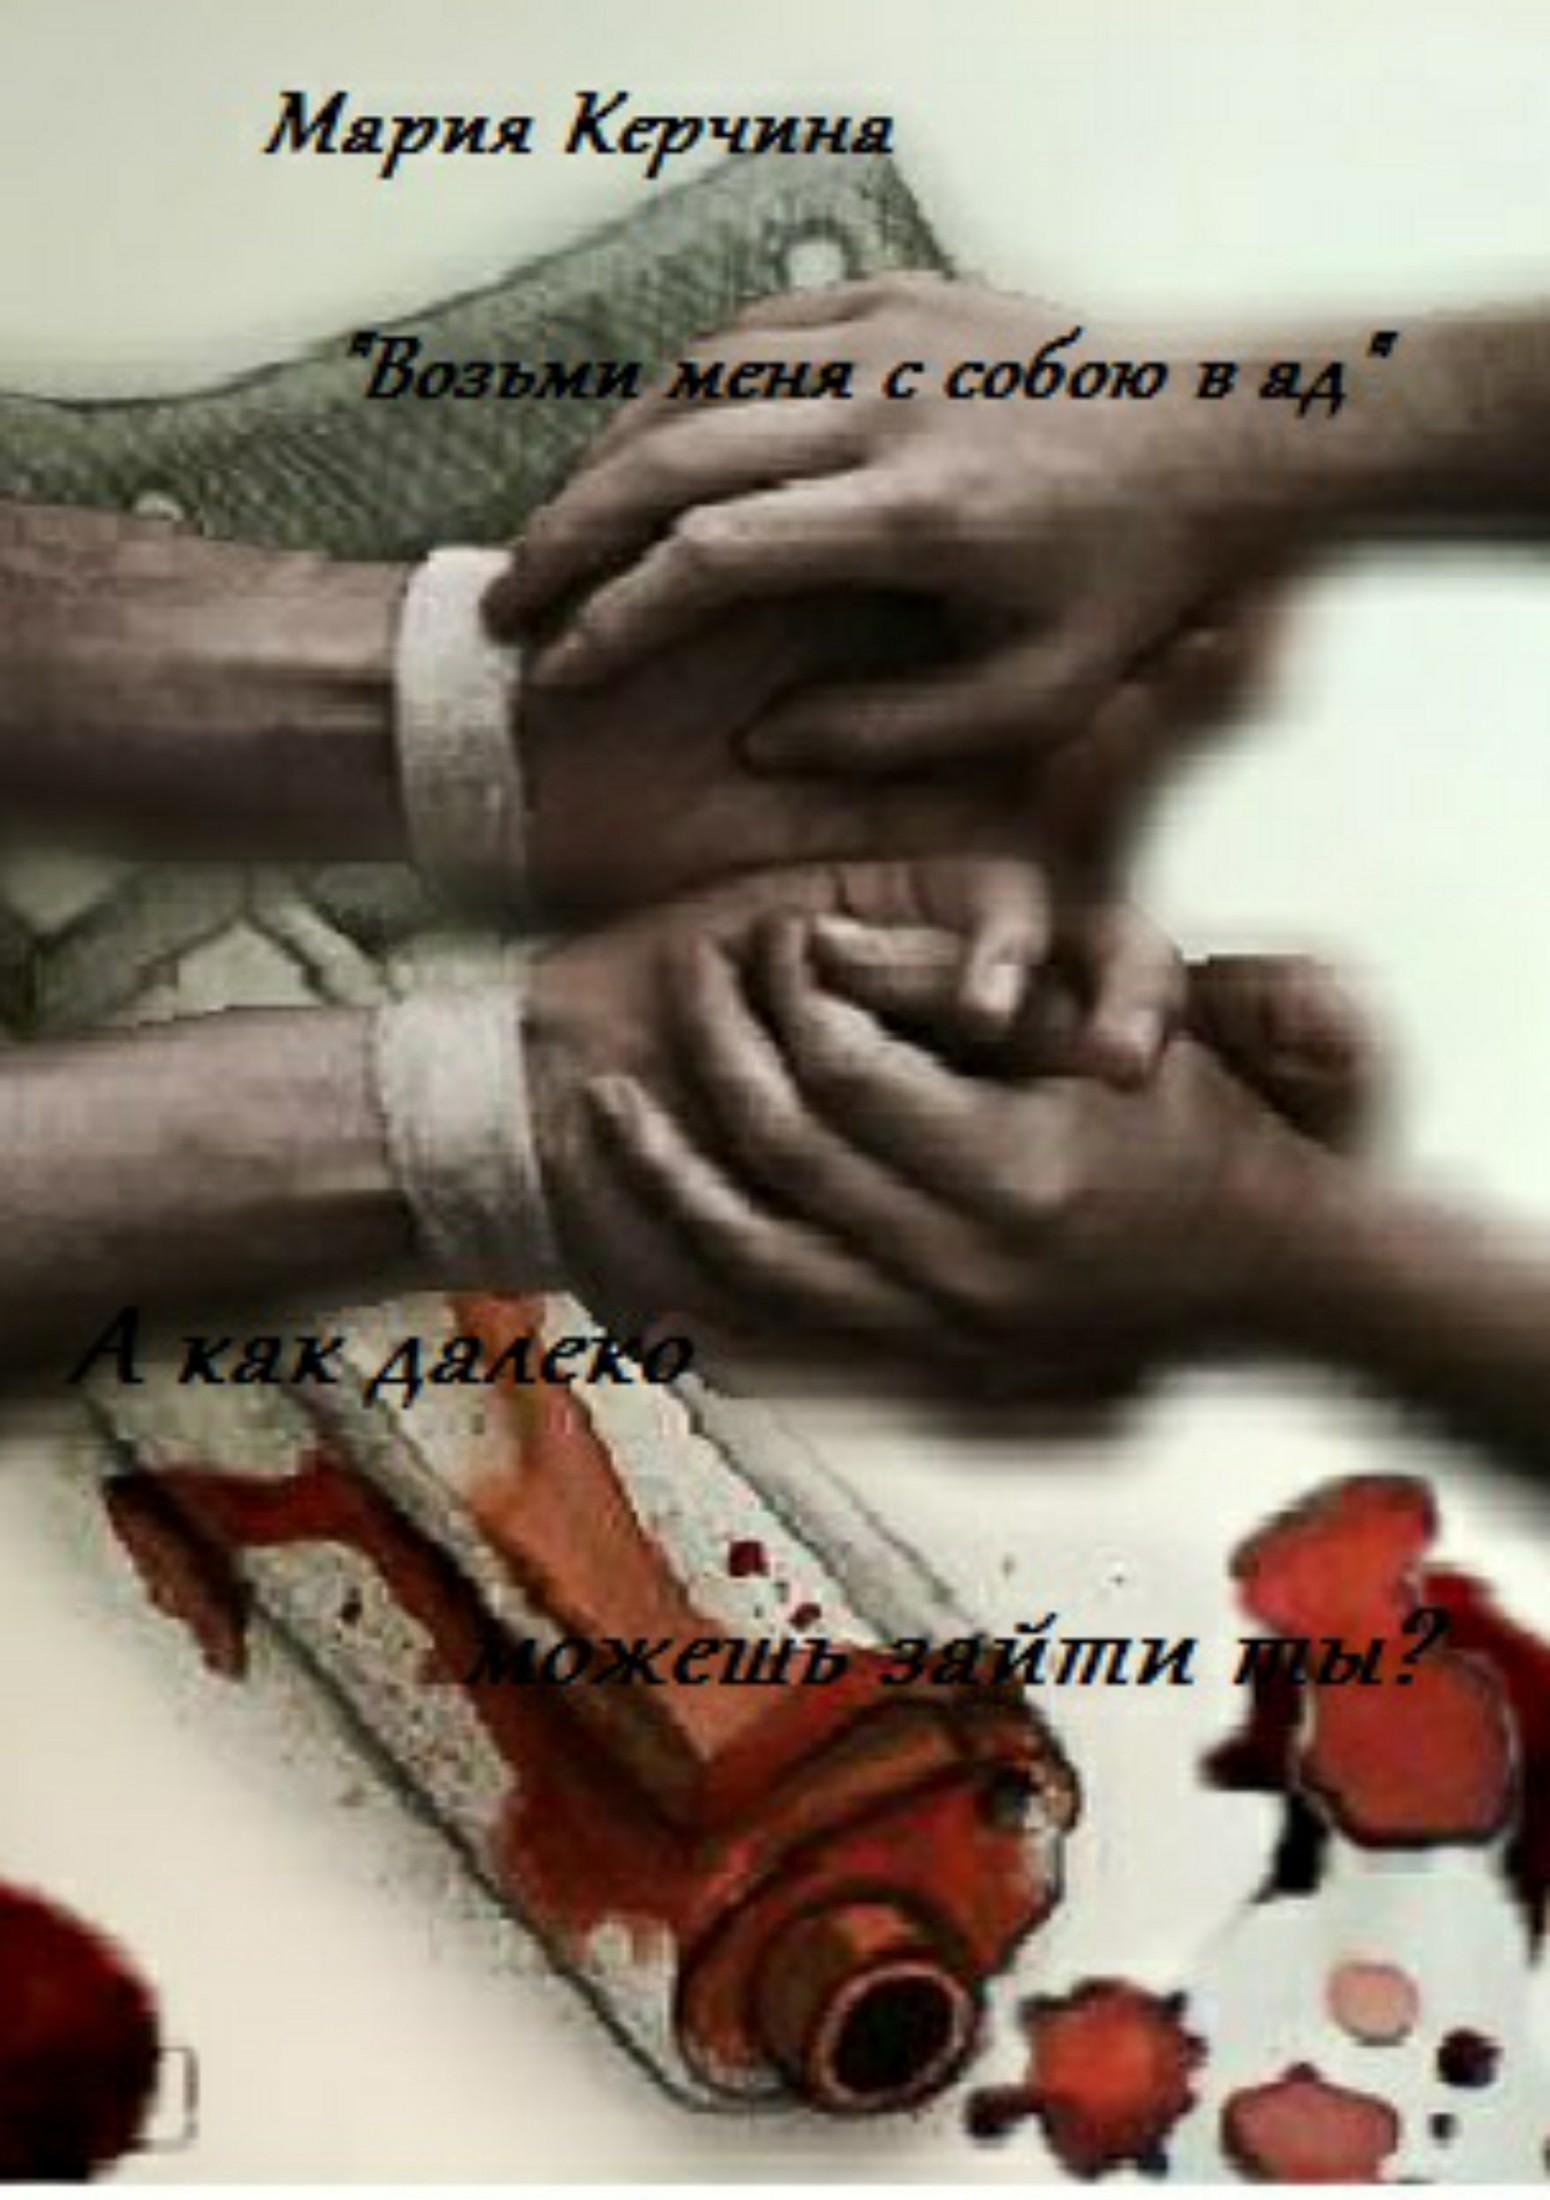 Мария Керчина - «Возьми меня с собою в ад»